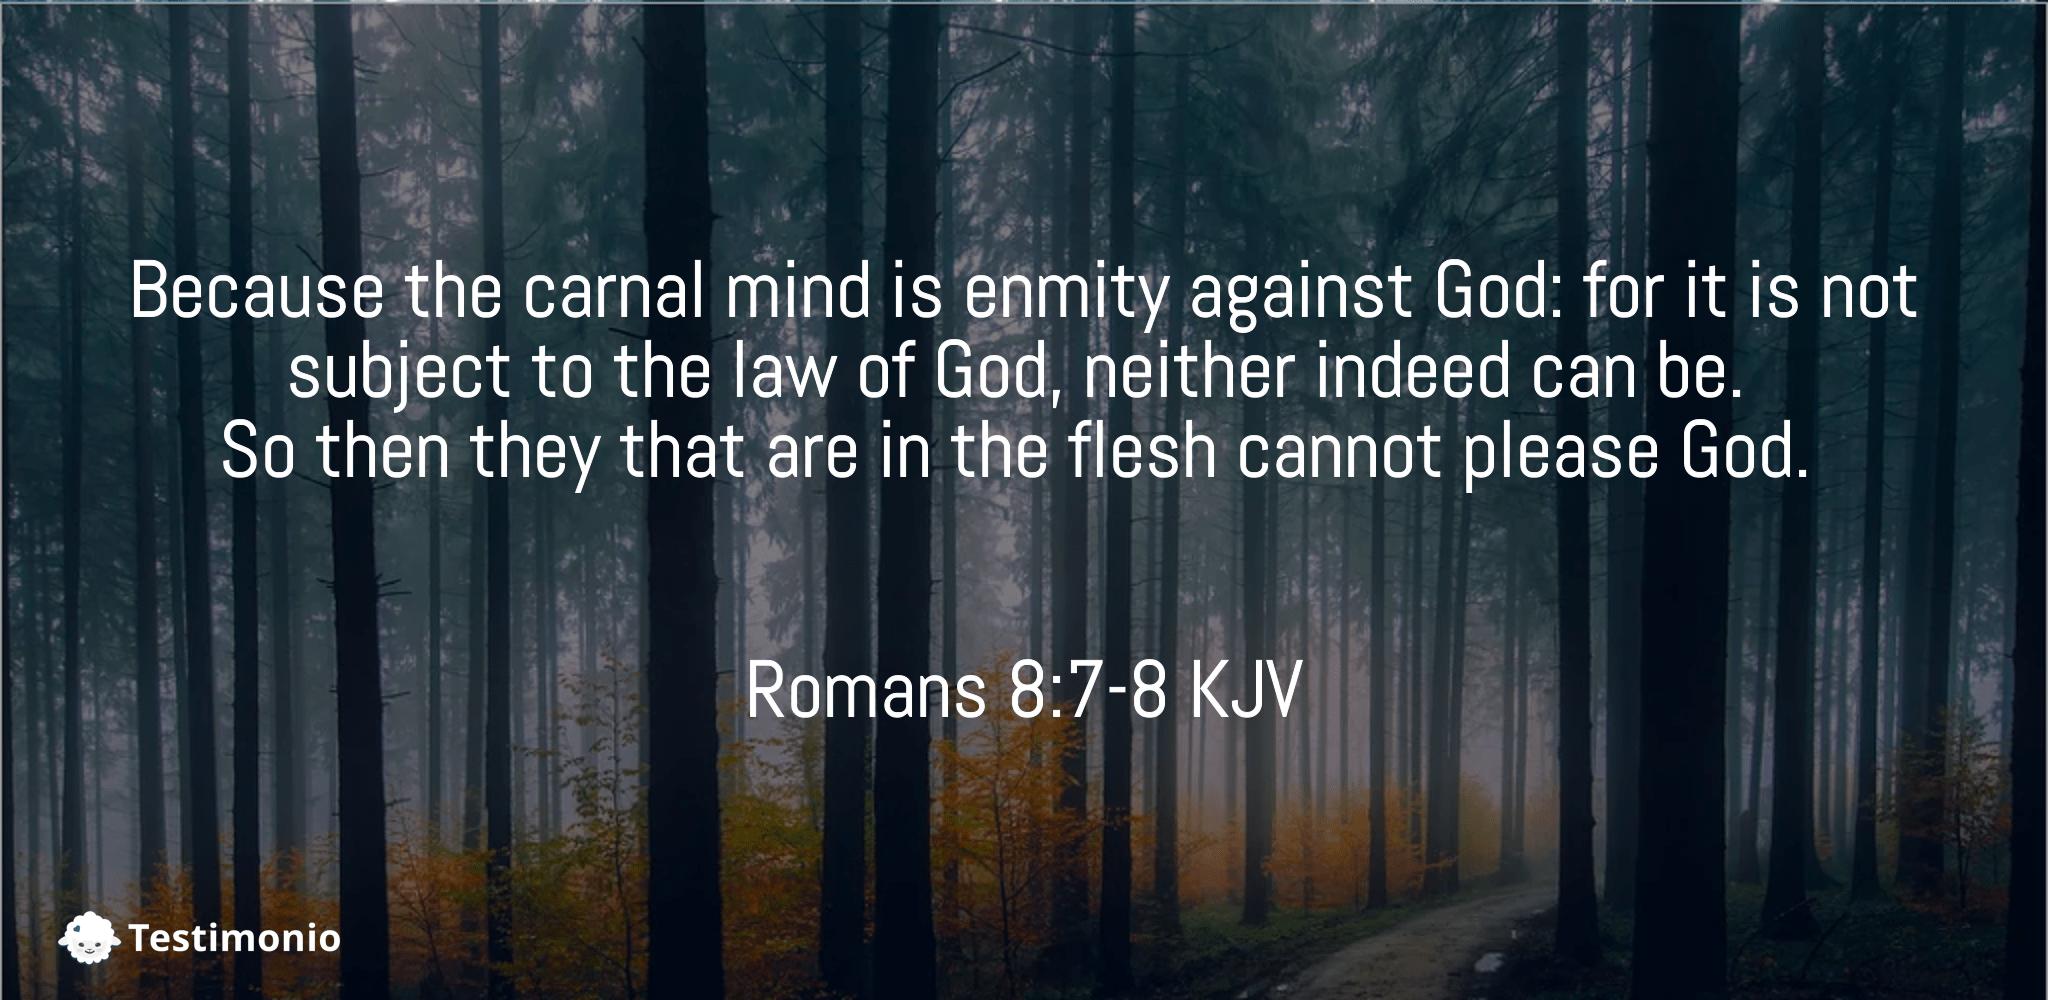 Romans 8:7-8